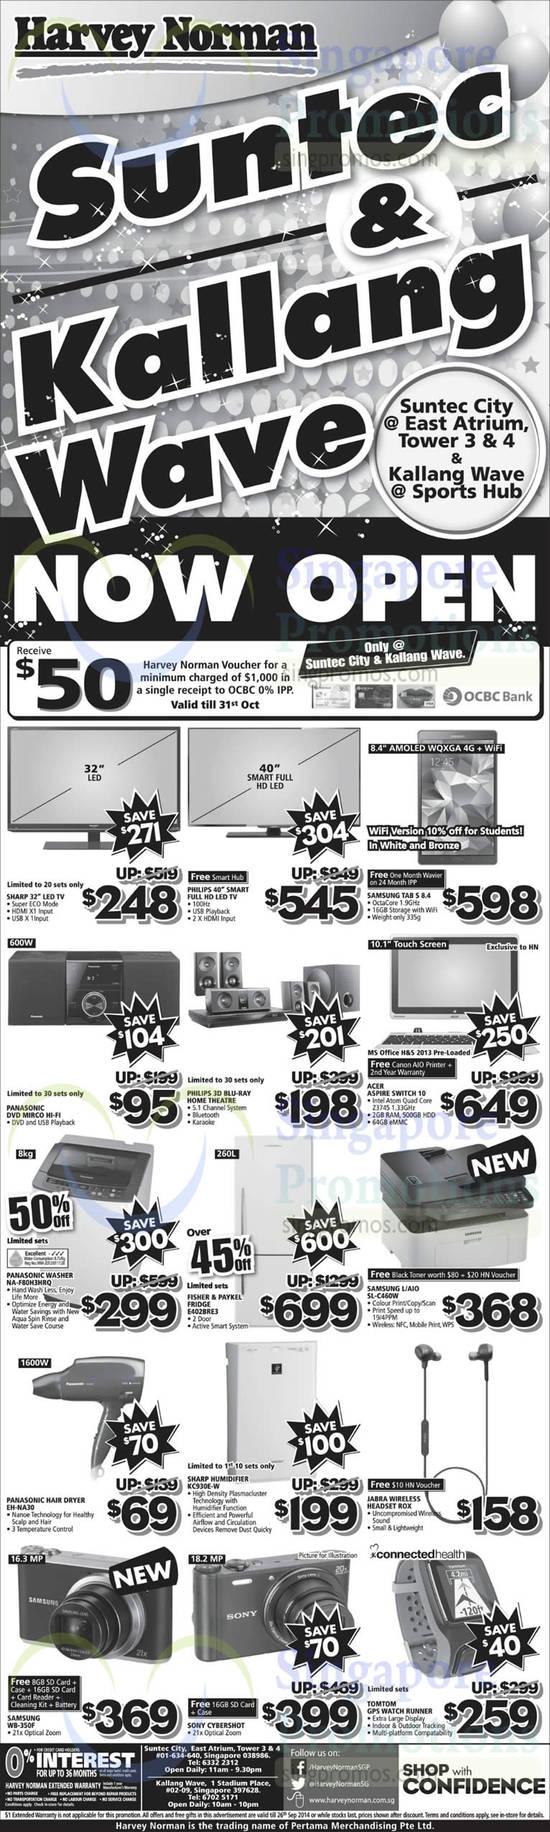 Samsung Tab S 8.4, Acer Aspire Switch 10 Desktop PC, Panasonic NA-F80H3HRQ Washer, Fisher & Paykel E402BRE2 Fridge, Samsung SL-C460W Printer, Panasonic EH-NA30 Hair Dryer, Sharp KC930E-W Humidifier, Samsung WB-350F Digital Camera